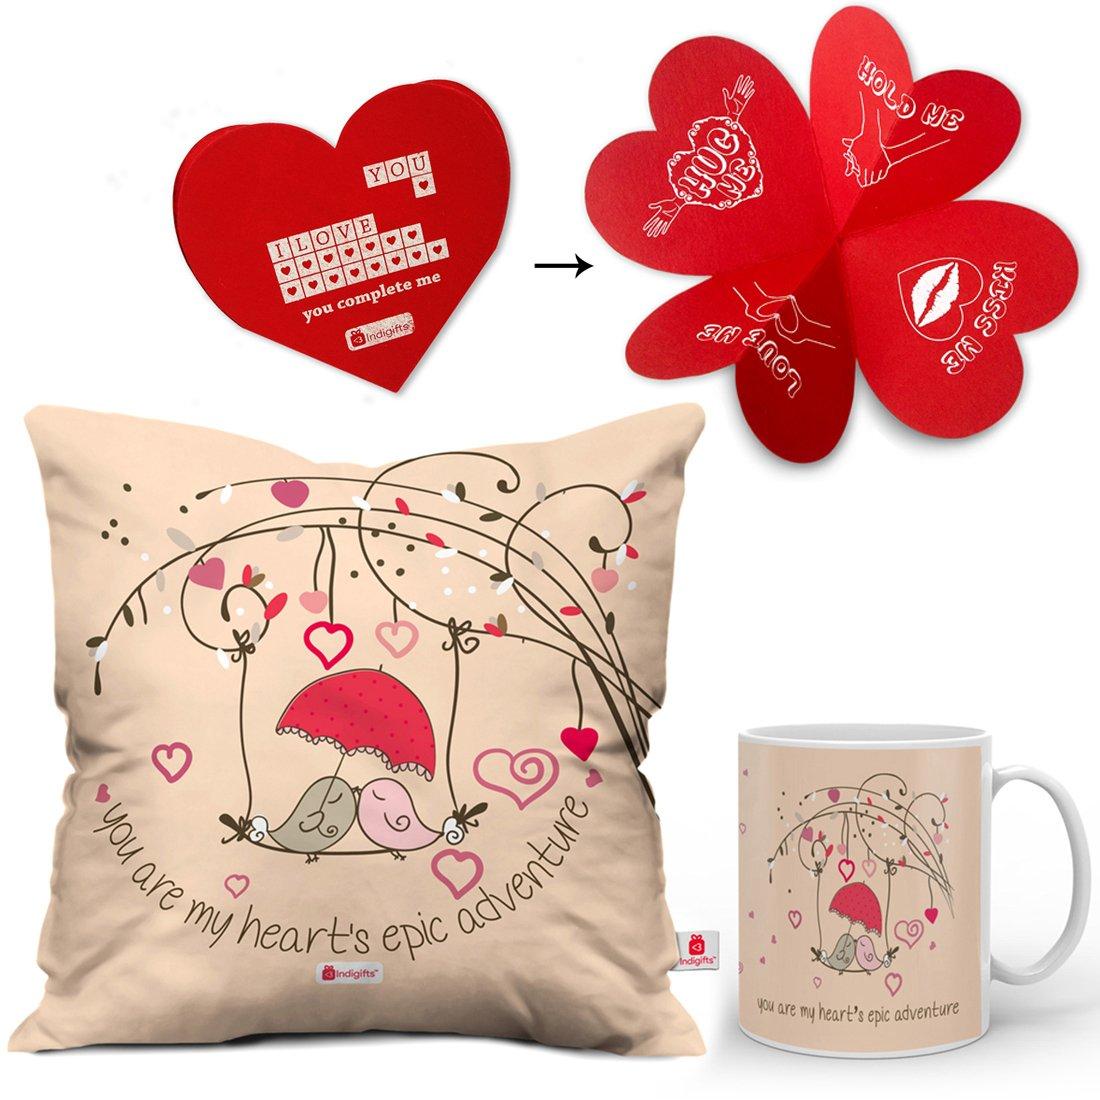 Valentine Gifts For Boyfriend Girlfriend Peach Love Birds Epic Adventure 12X12 Printed Filled Cushion Best Quality Ceramic Mug Gift Him Her Wife